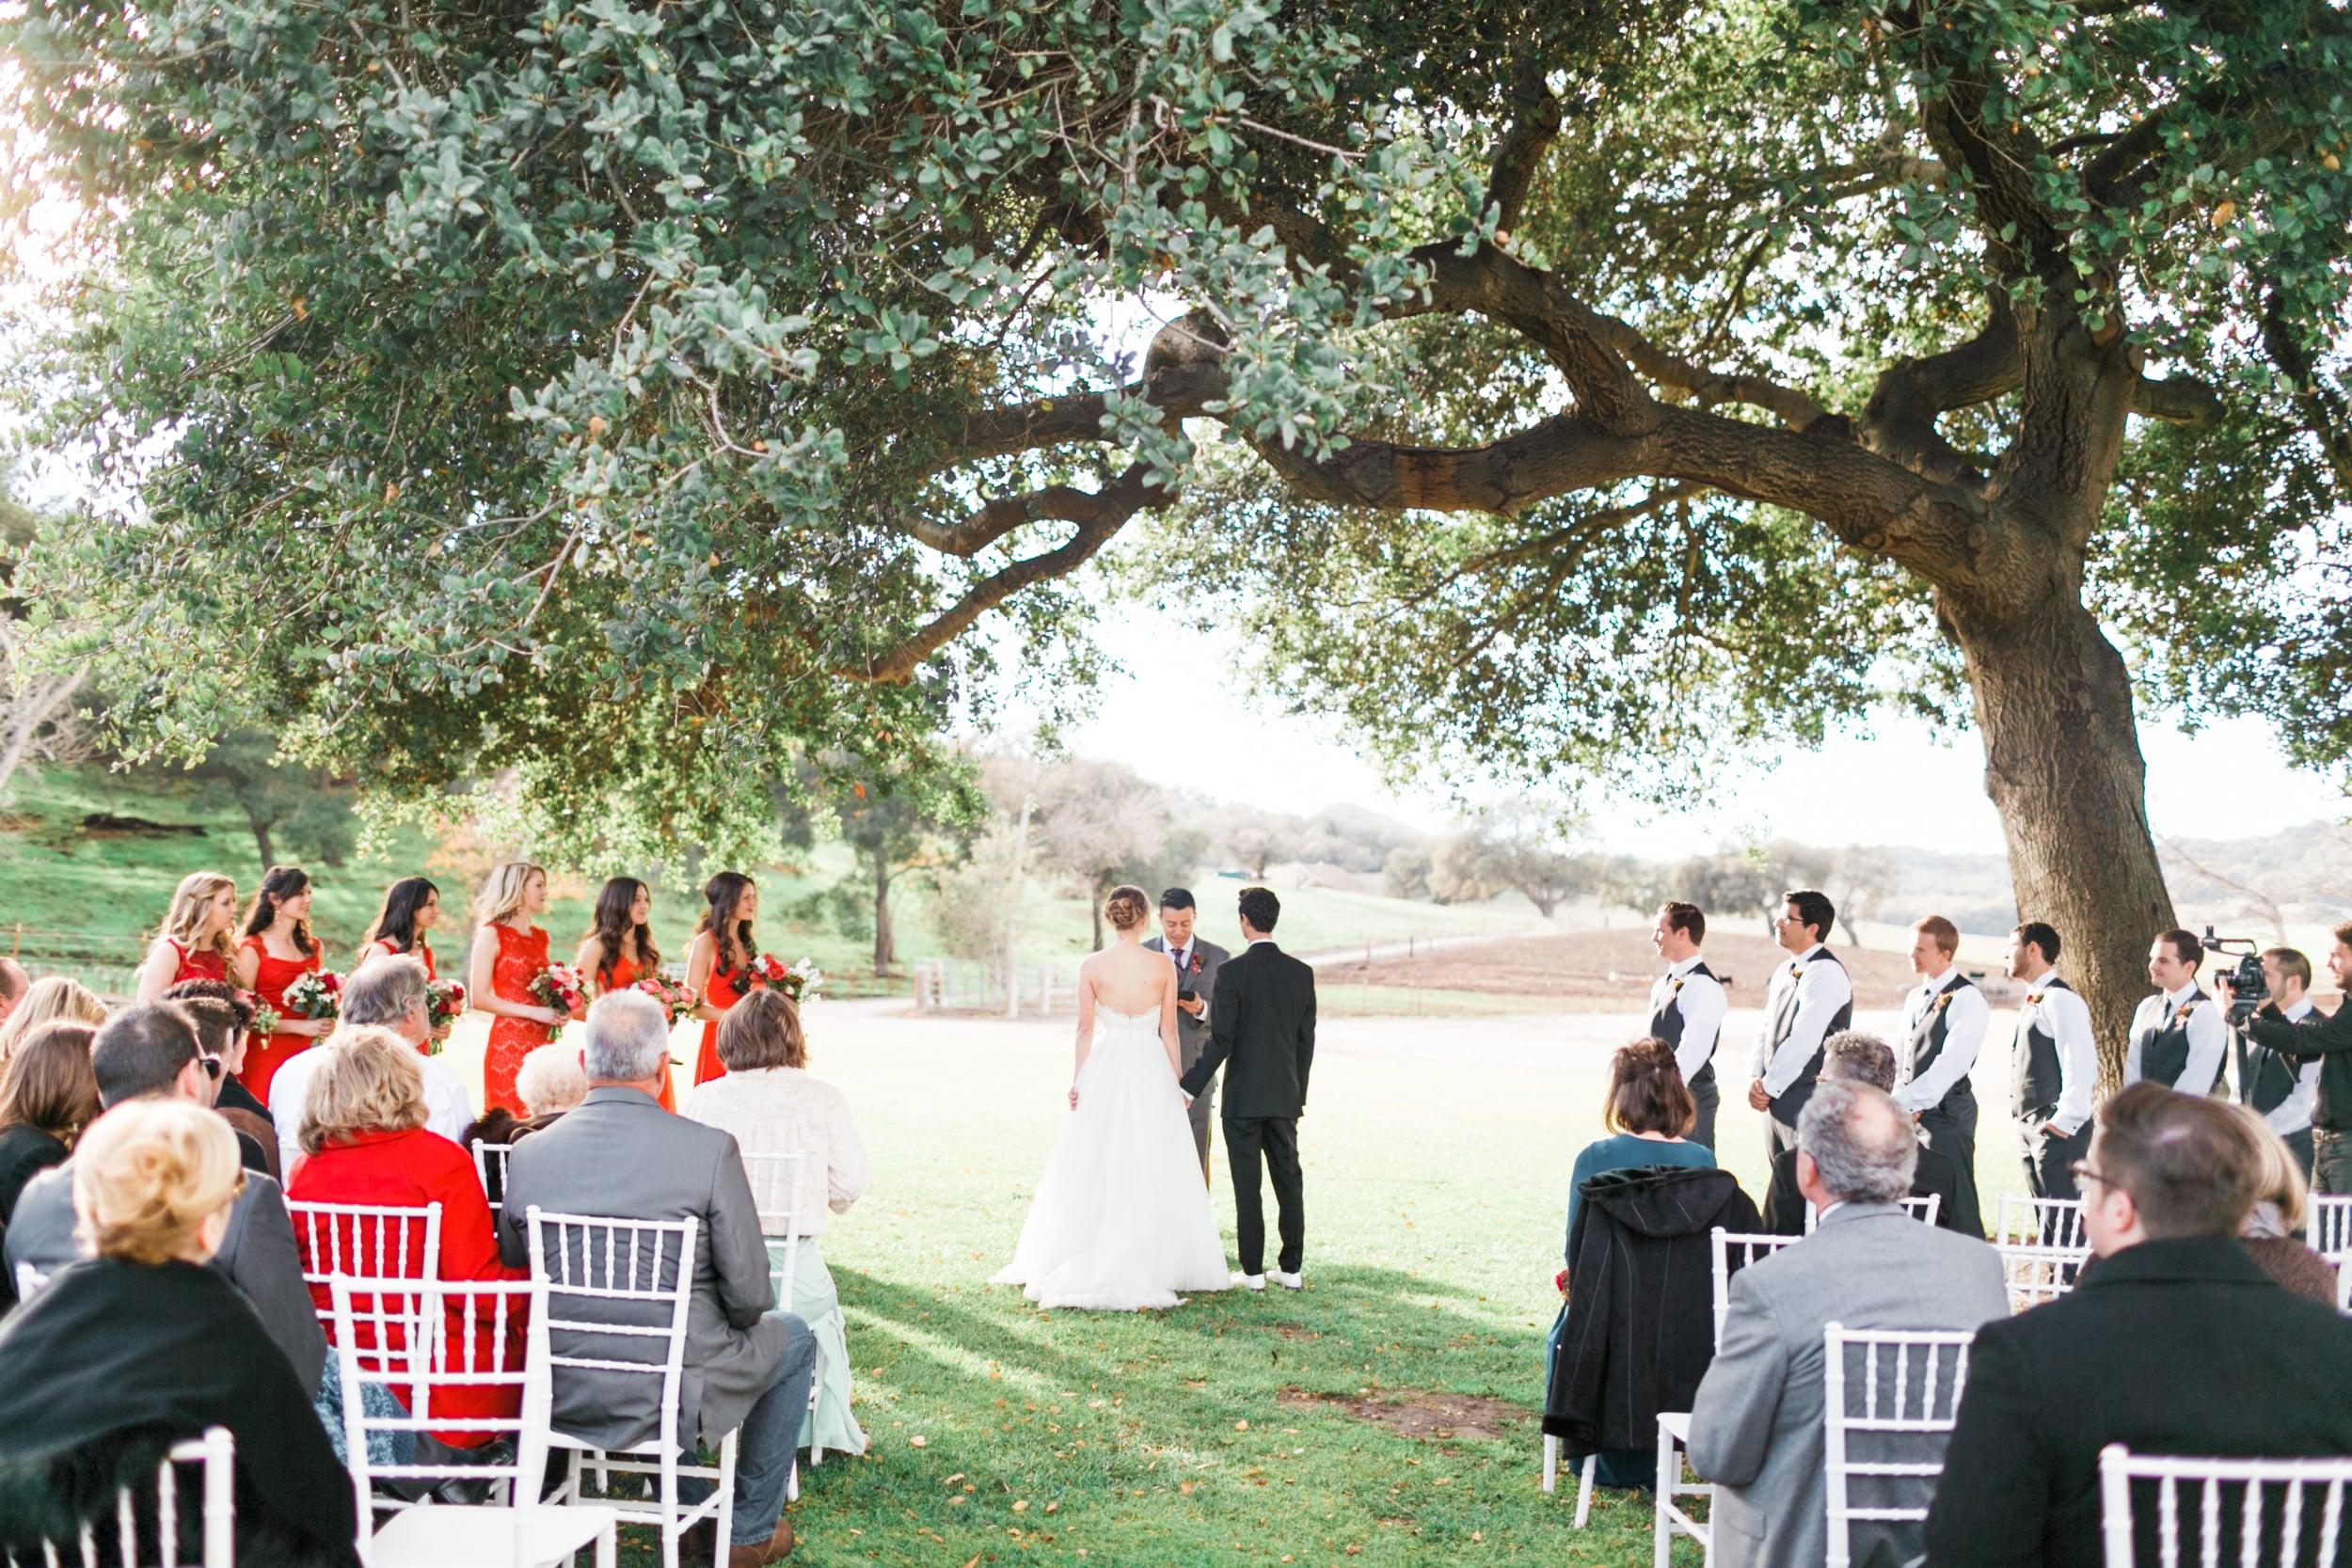 Natalie_Schutt_Photography_Winter_Wedding_San_Luis_Obispo-107.jpg